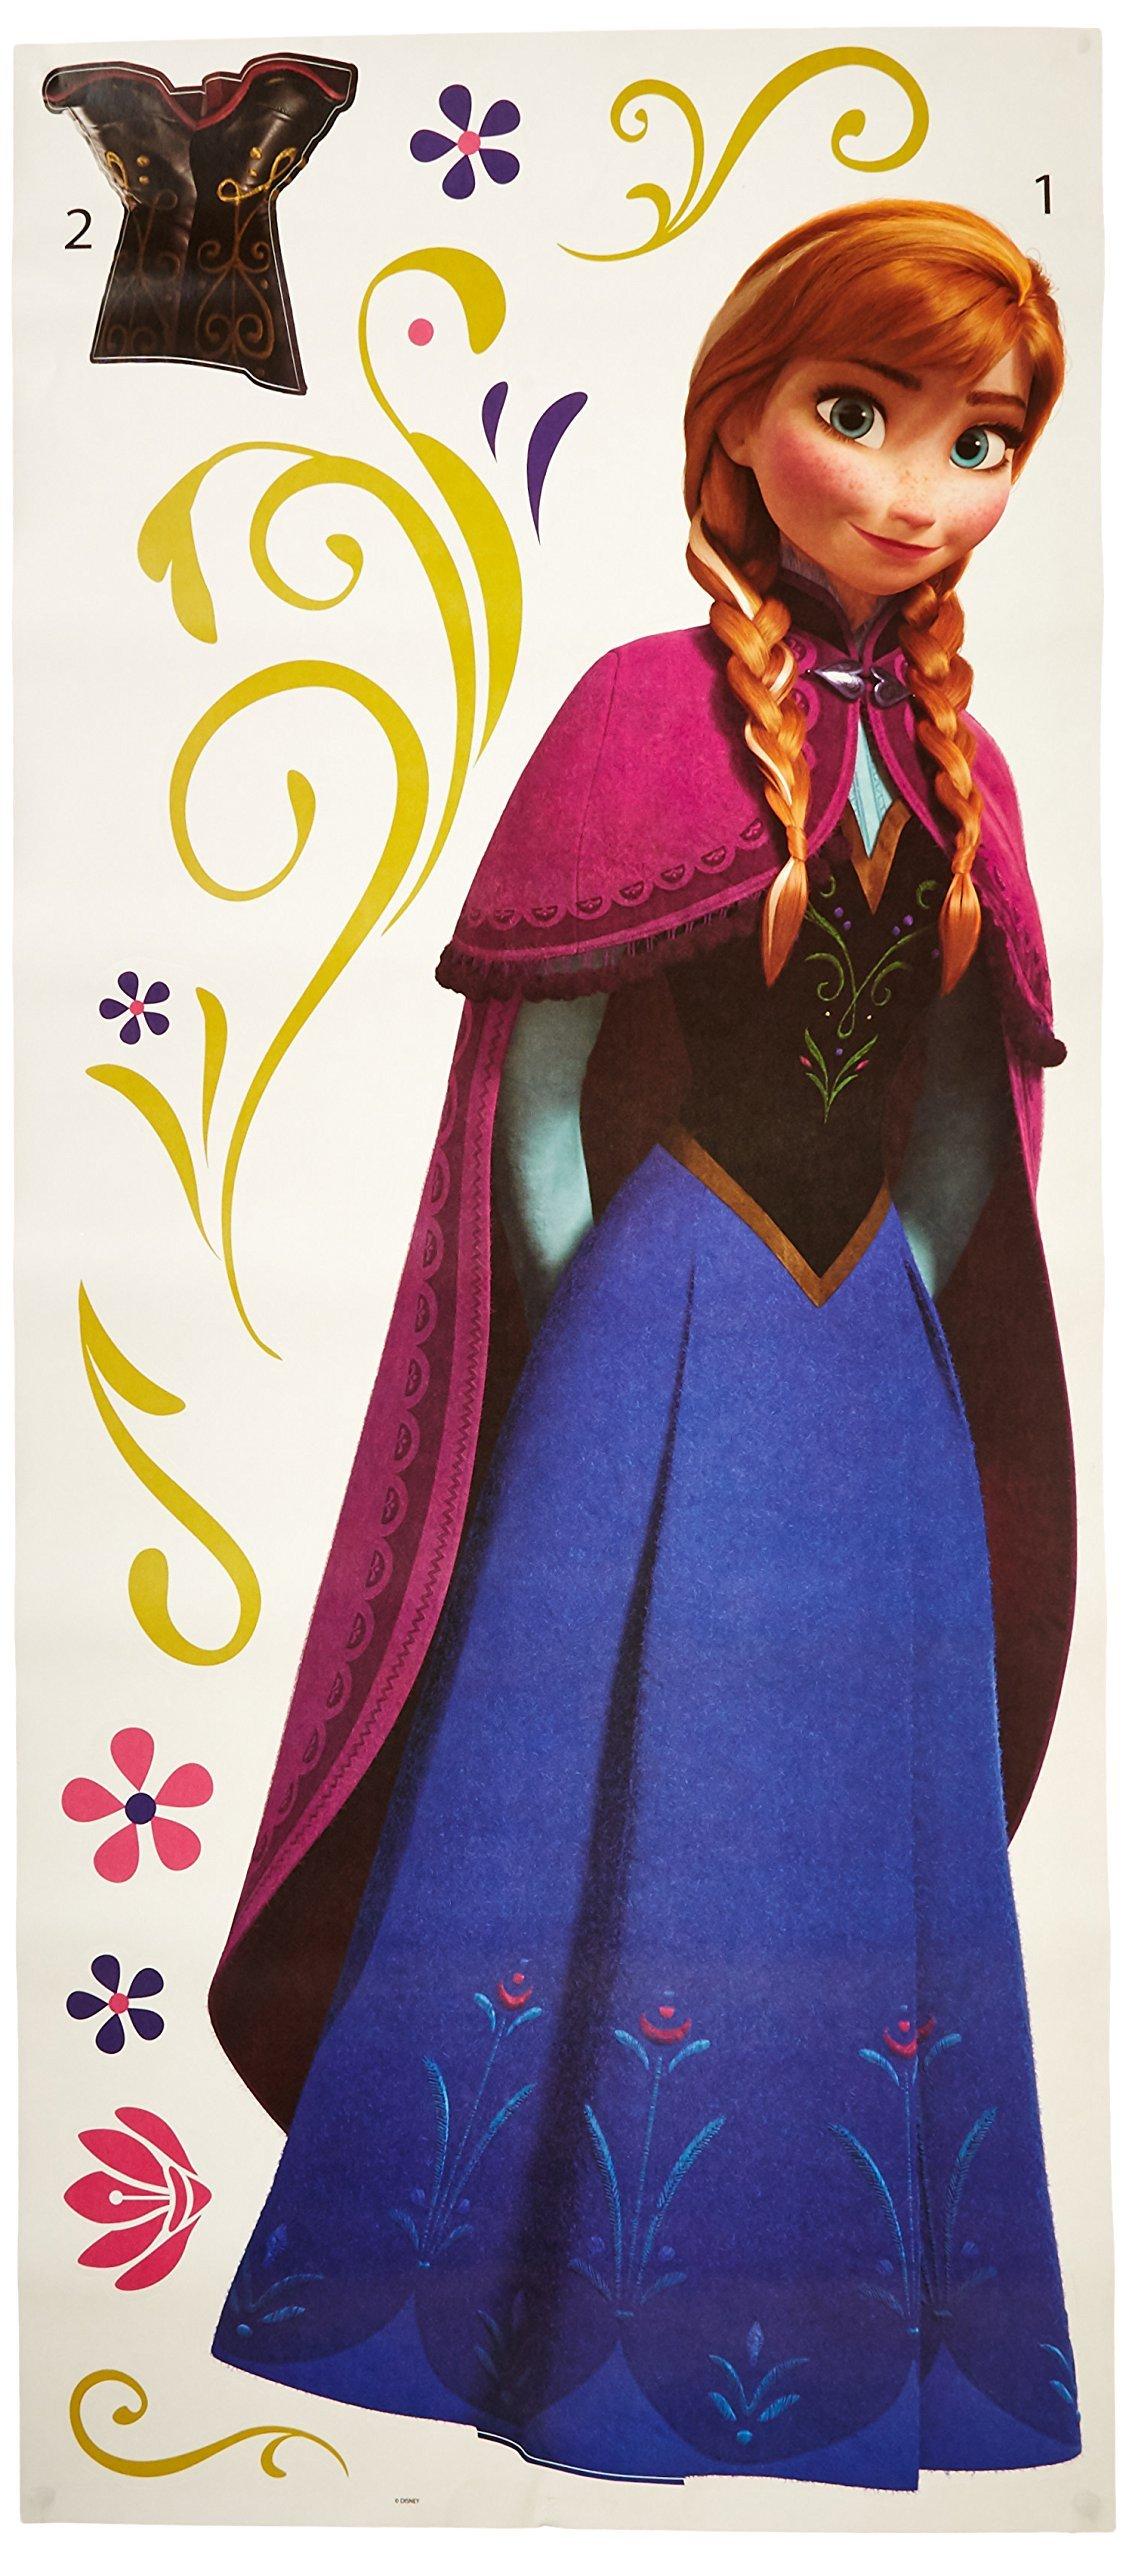 Vinilo Decorativo Pared [0MBPC9VU] Frozen Anna